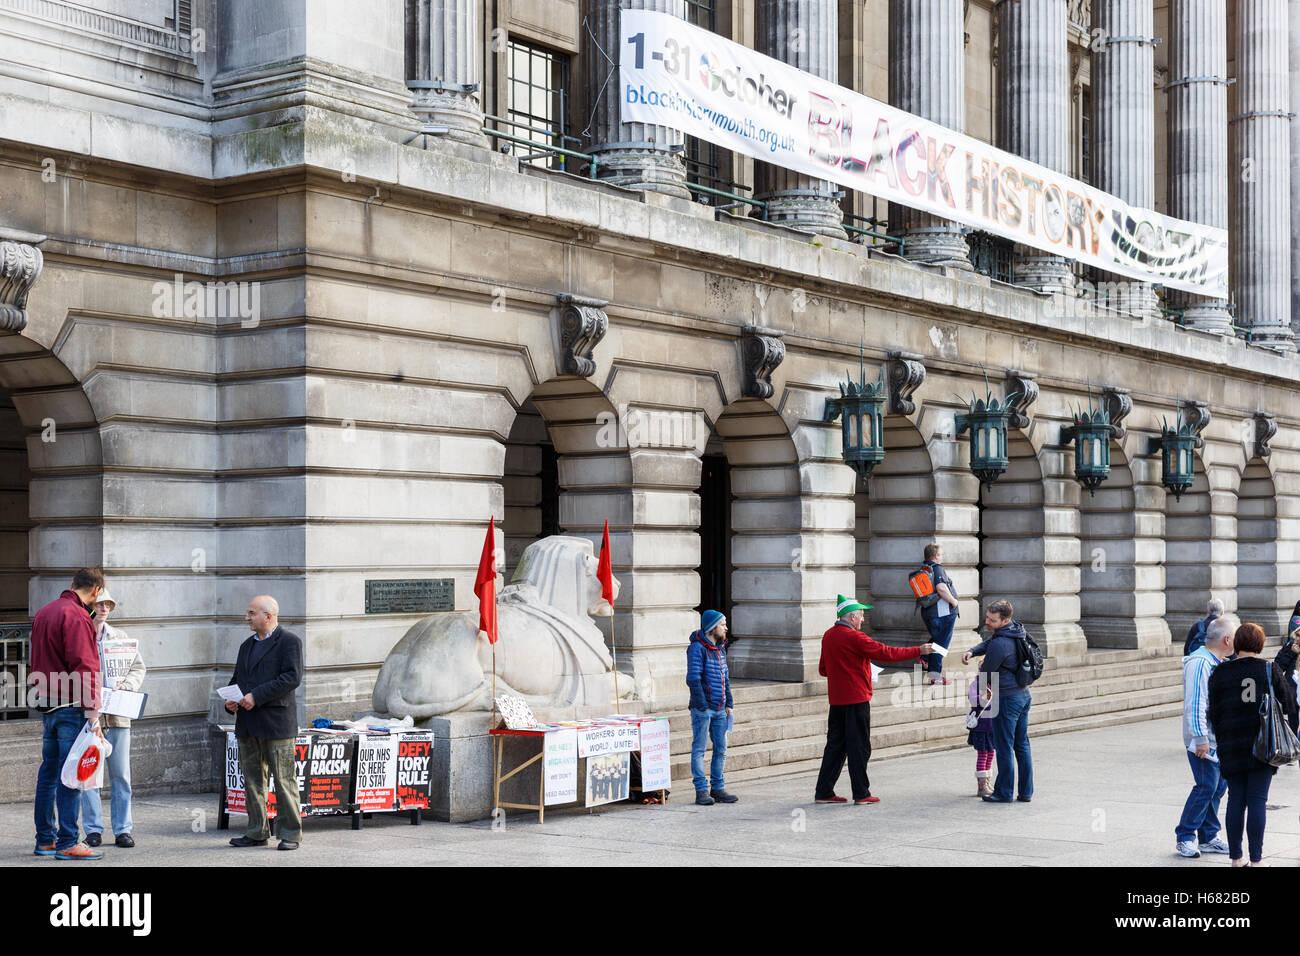 Aktivisten Flugblätter im Namen der Socialist Worker austeilen. In Nottingham, England. Stockbild